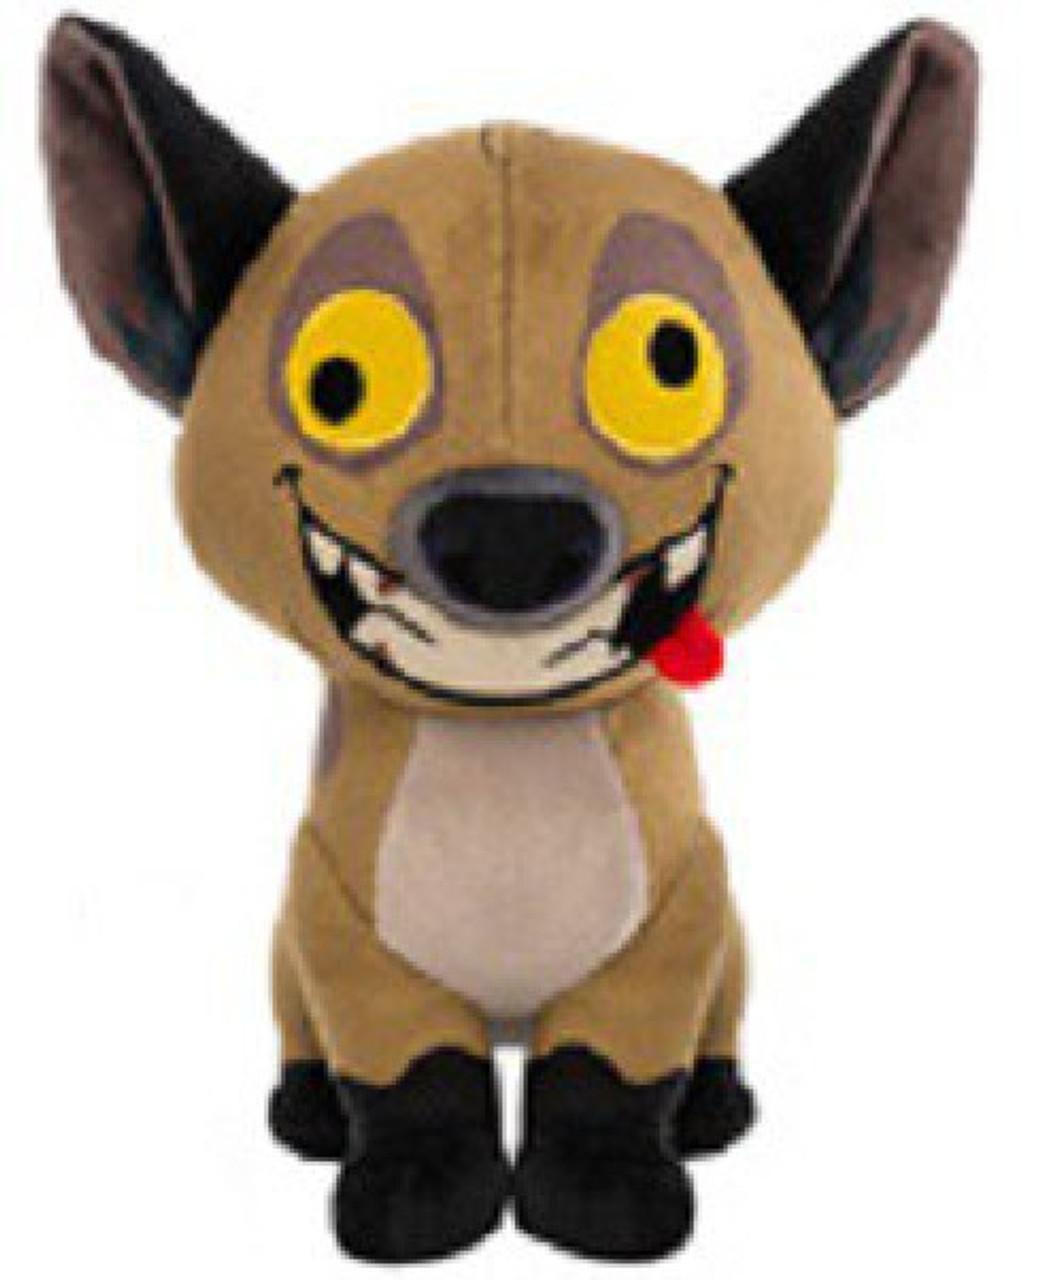 63f0691e4bb Funko Disney The Lion King Plushies Ed Plush 1994 - ToyWiz